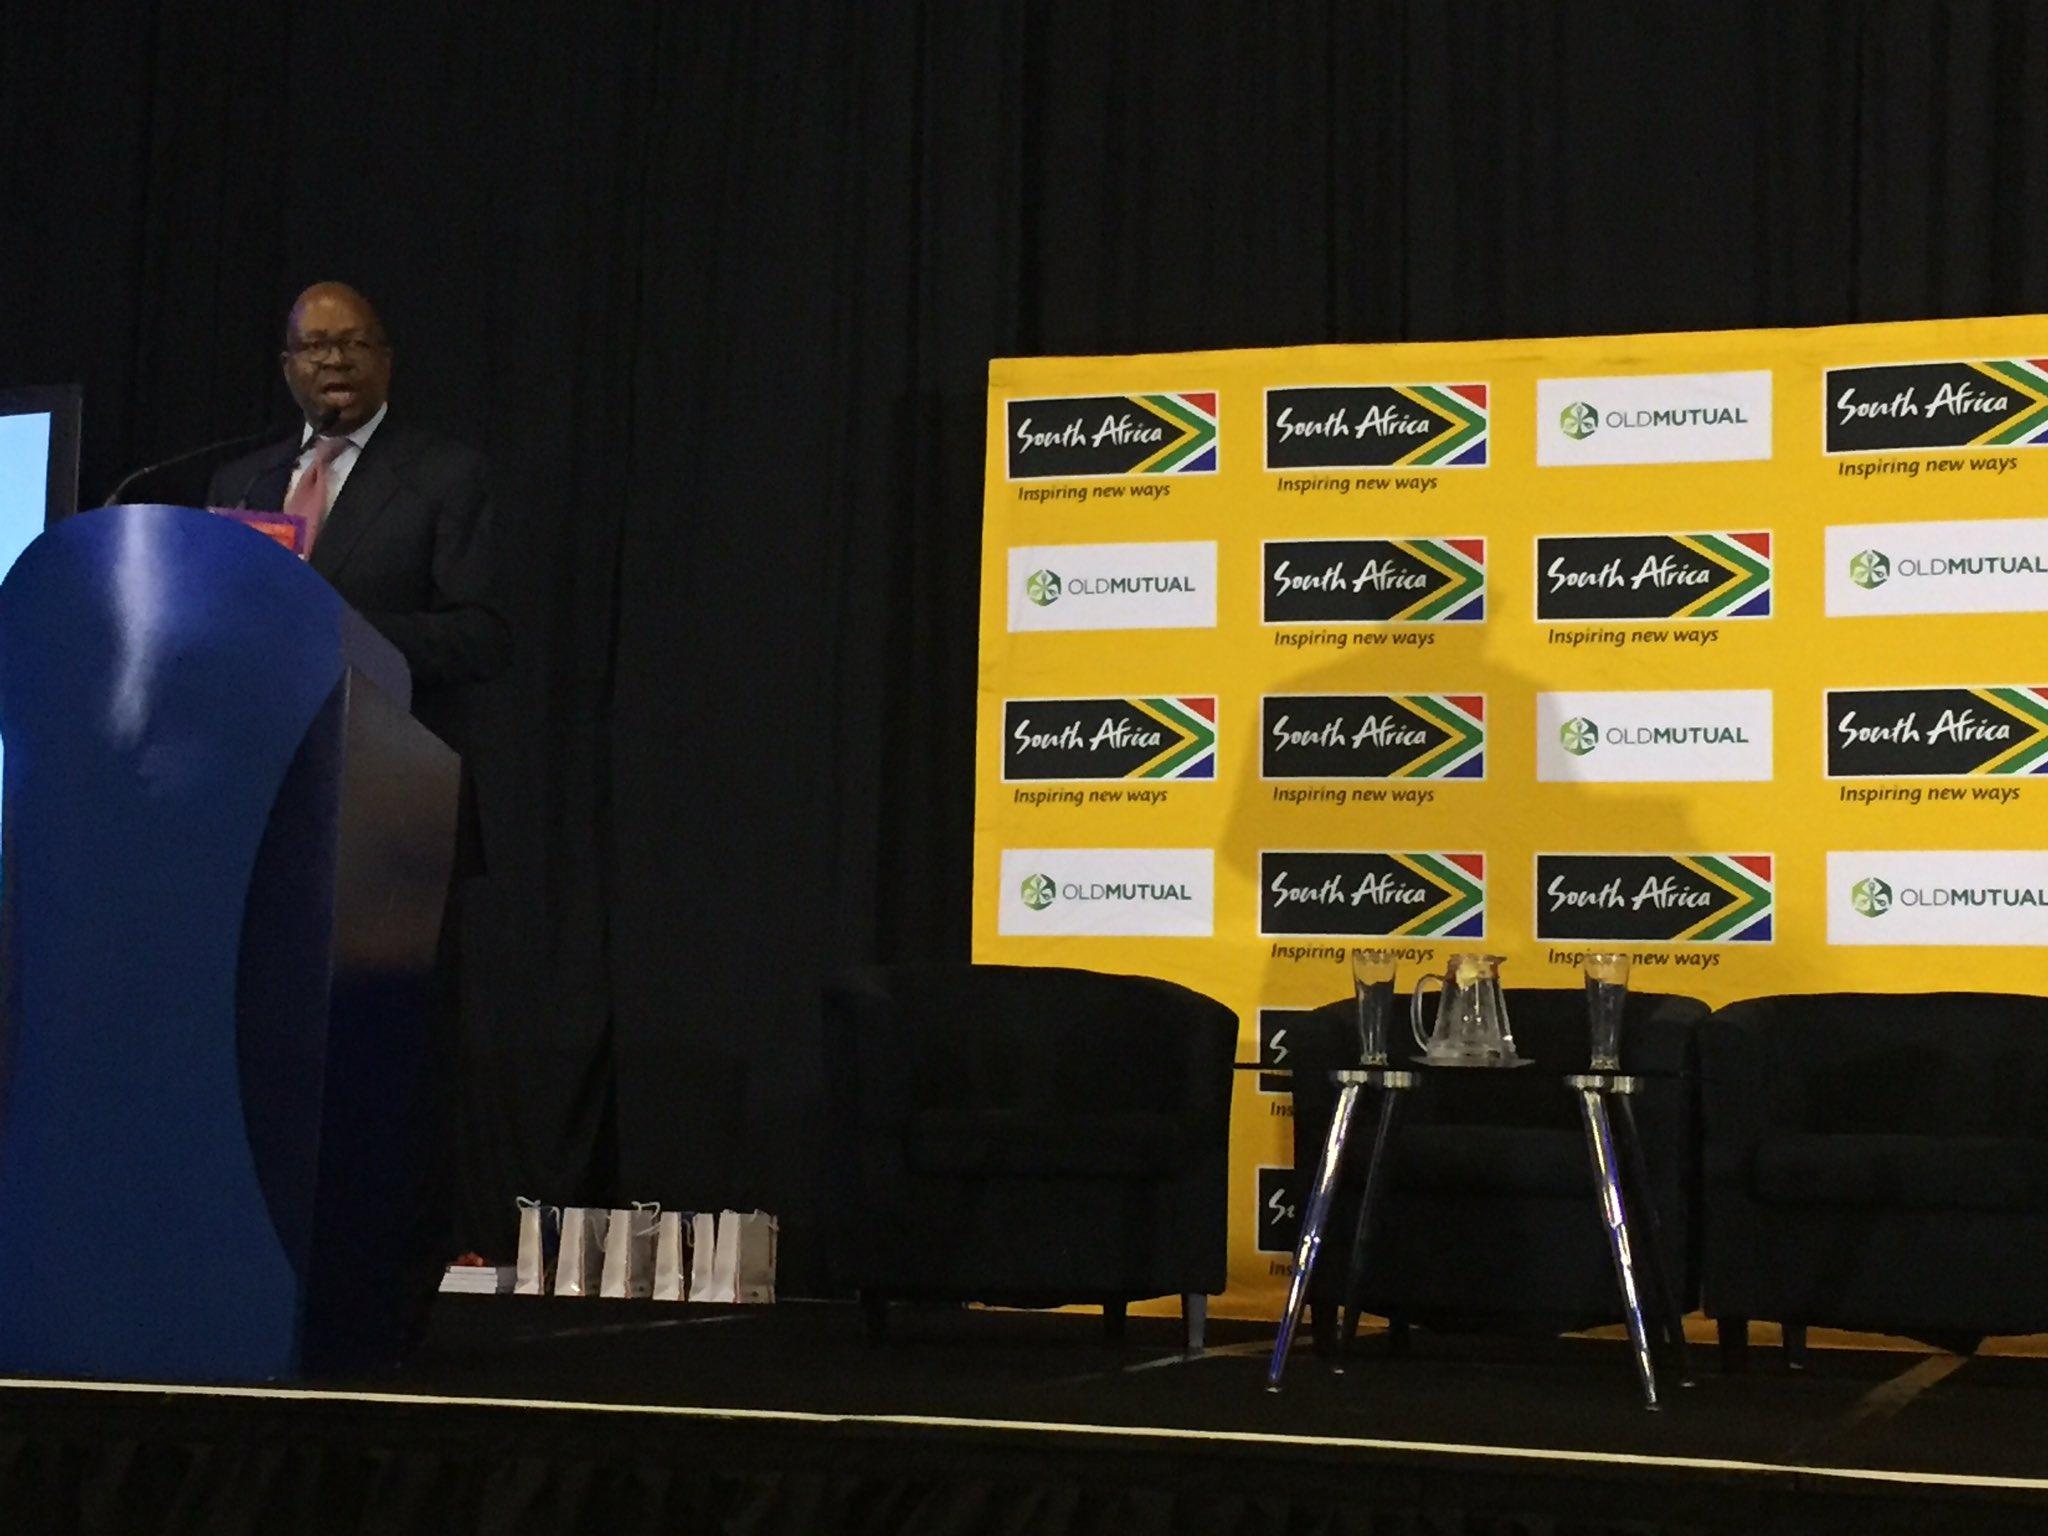 #KibgsleyMakhubela kicks off the @Brand_SA breakfast #youth #connectingAfrica #WEFAfrica2017 https://t.co/Gh0HNh3Zi6